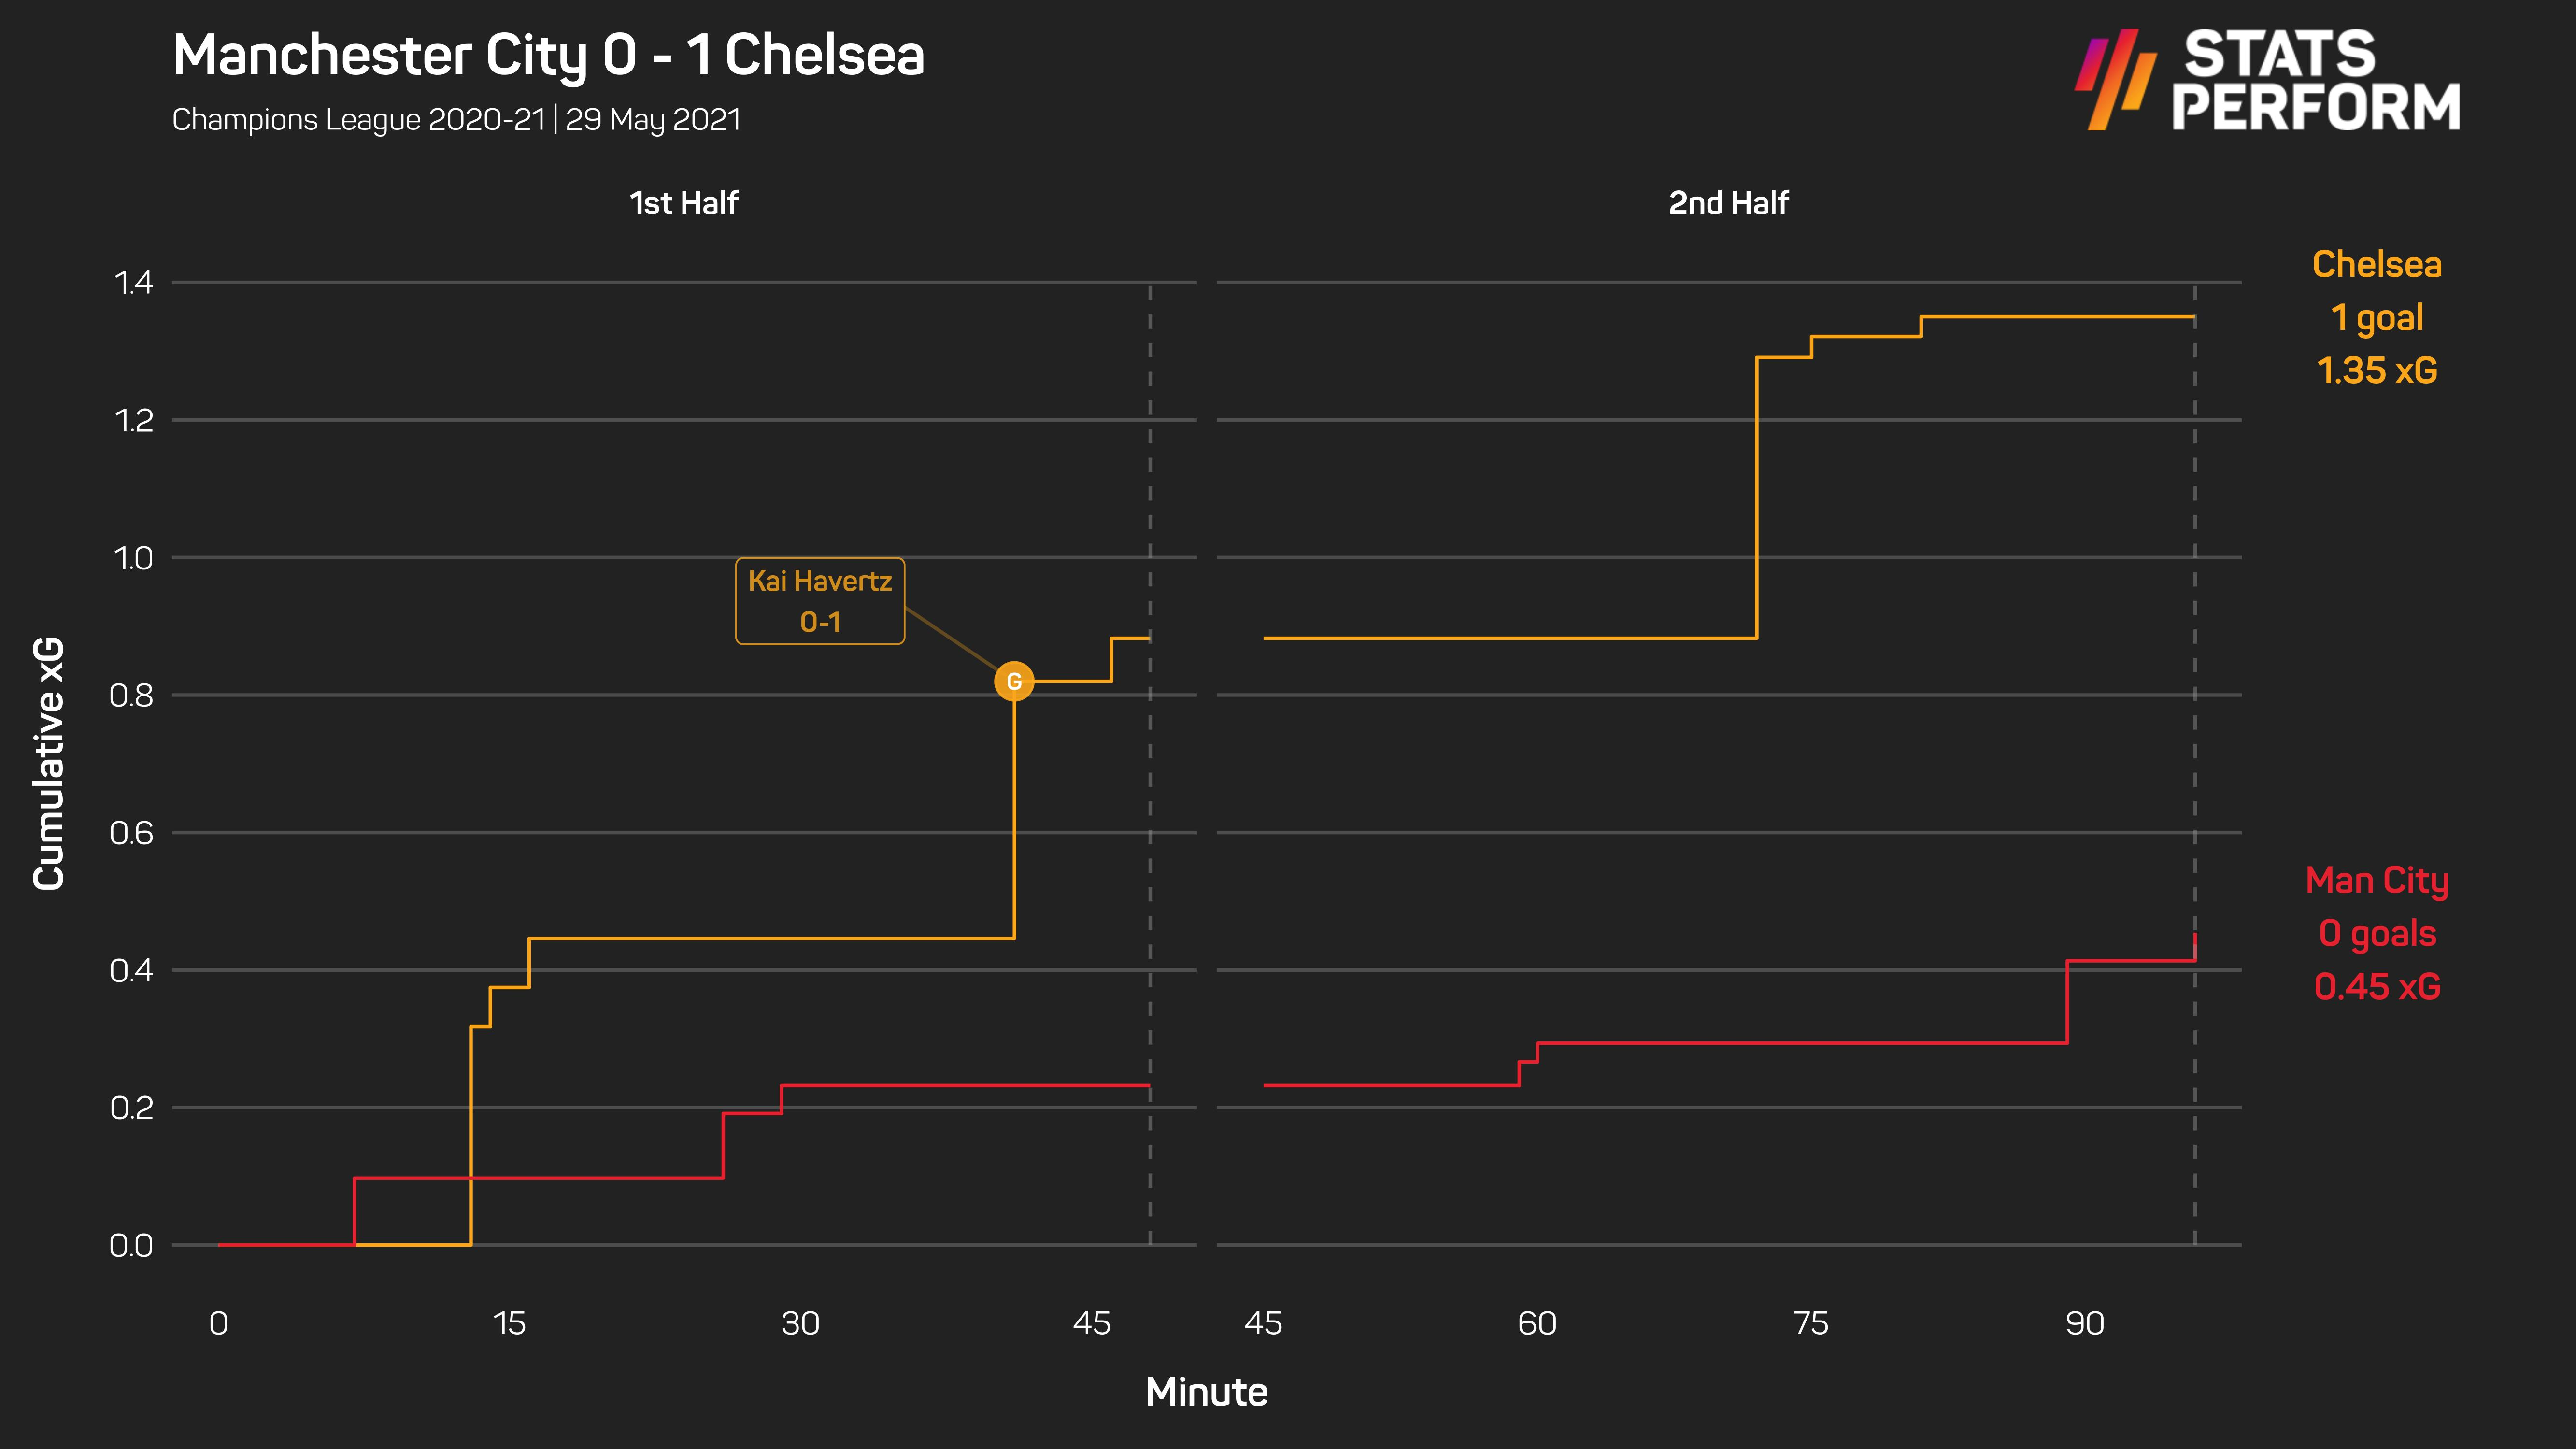 Manchester City 0-1 Chelsea